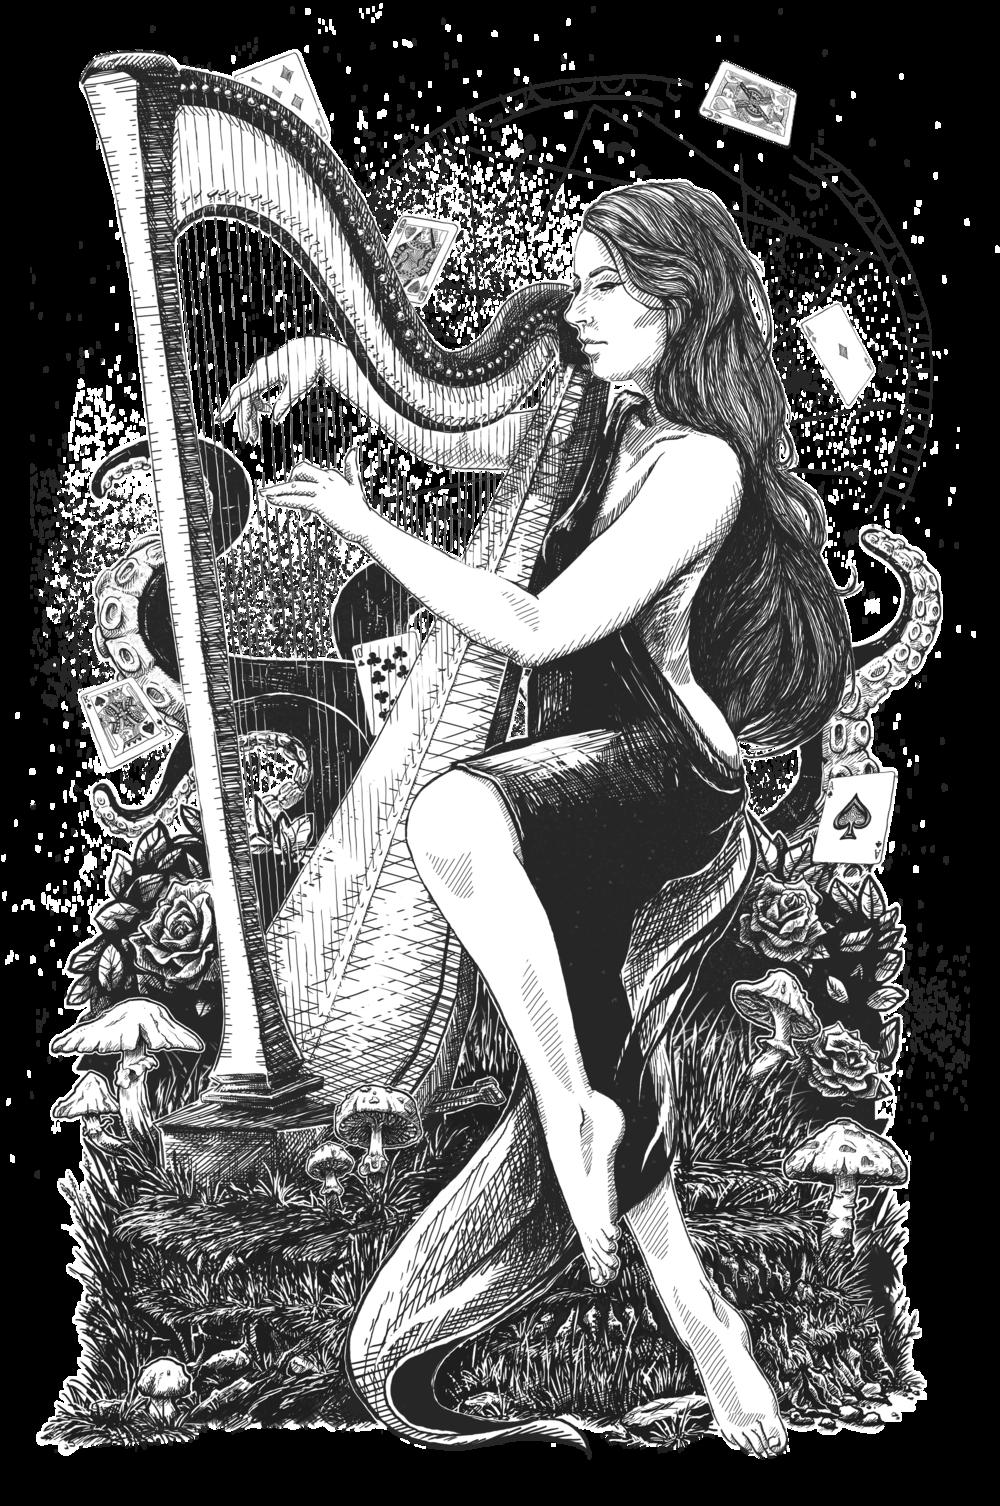 The Harpist Illustration